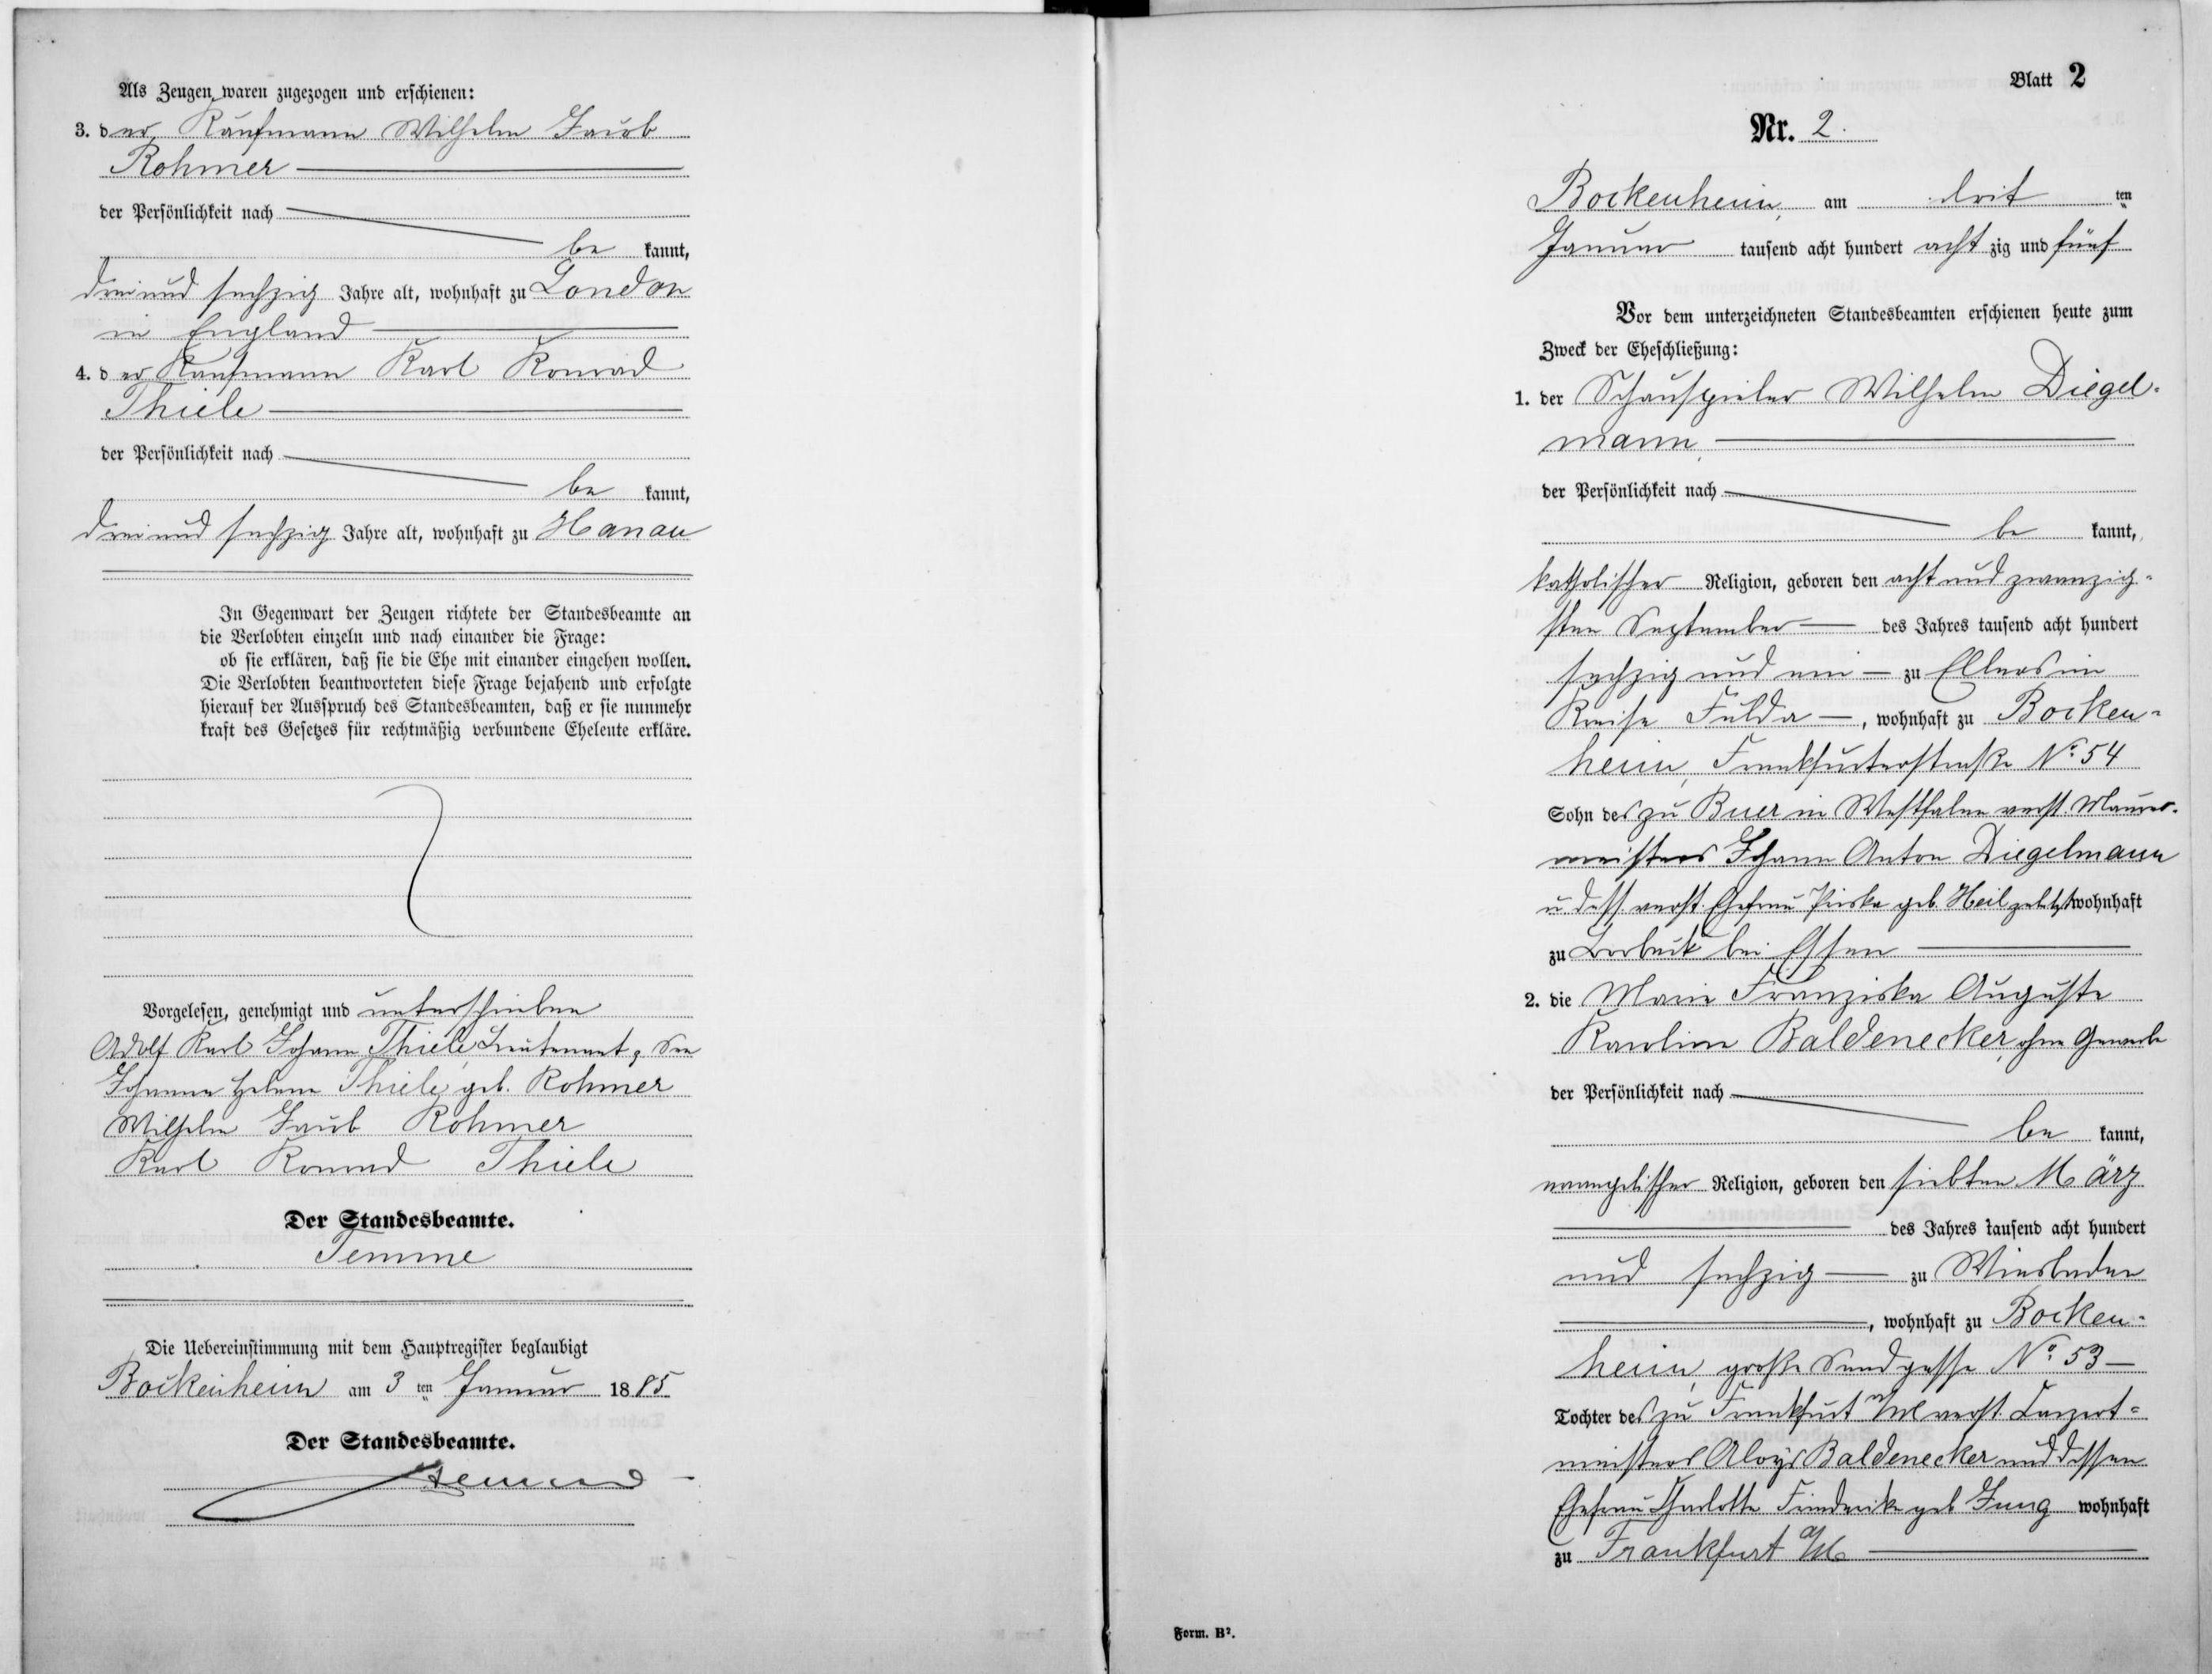 Marriage record of Wilhelm Diegelmann and Marie Franziska Auguste Karoline Baldenecker from the Germany, Hesse Marriage Index, 1849–1931